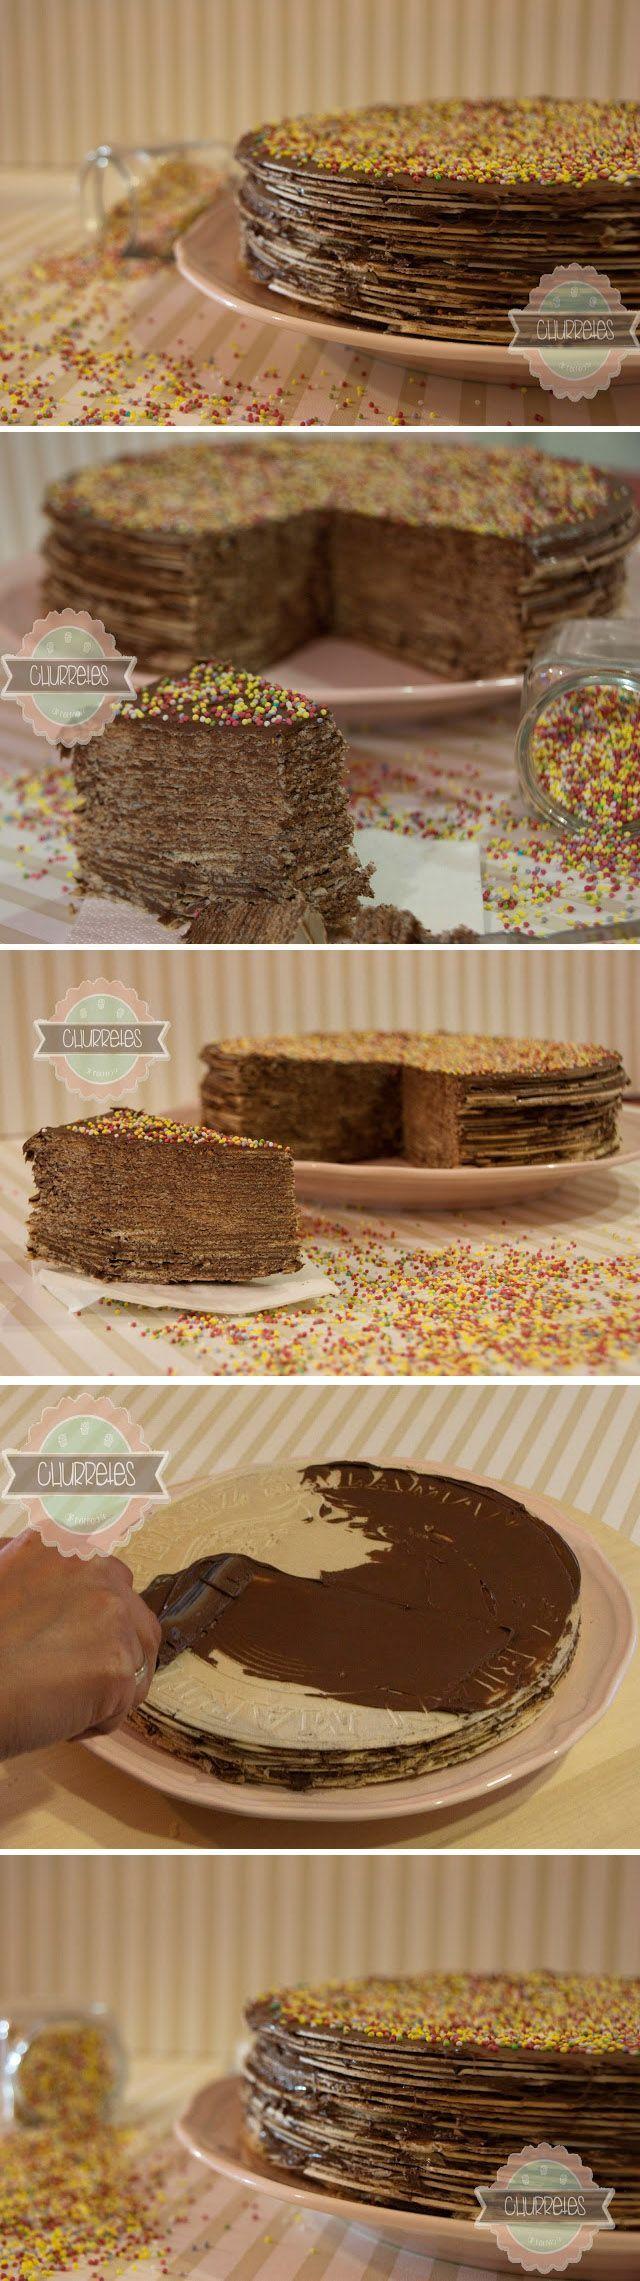 tarta-obleas-nutella-pecados-reposteria-1